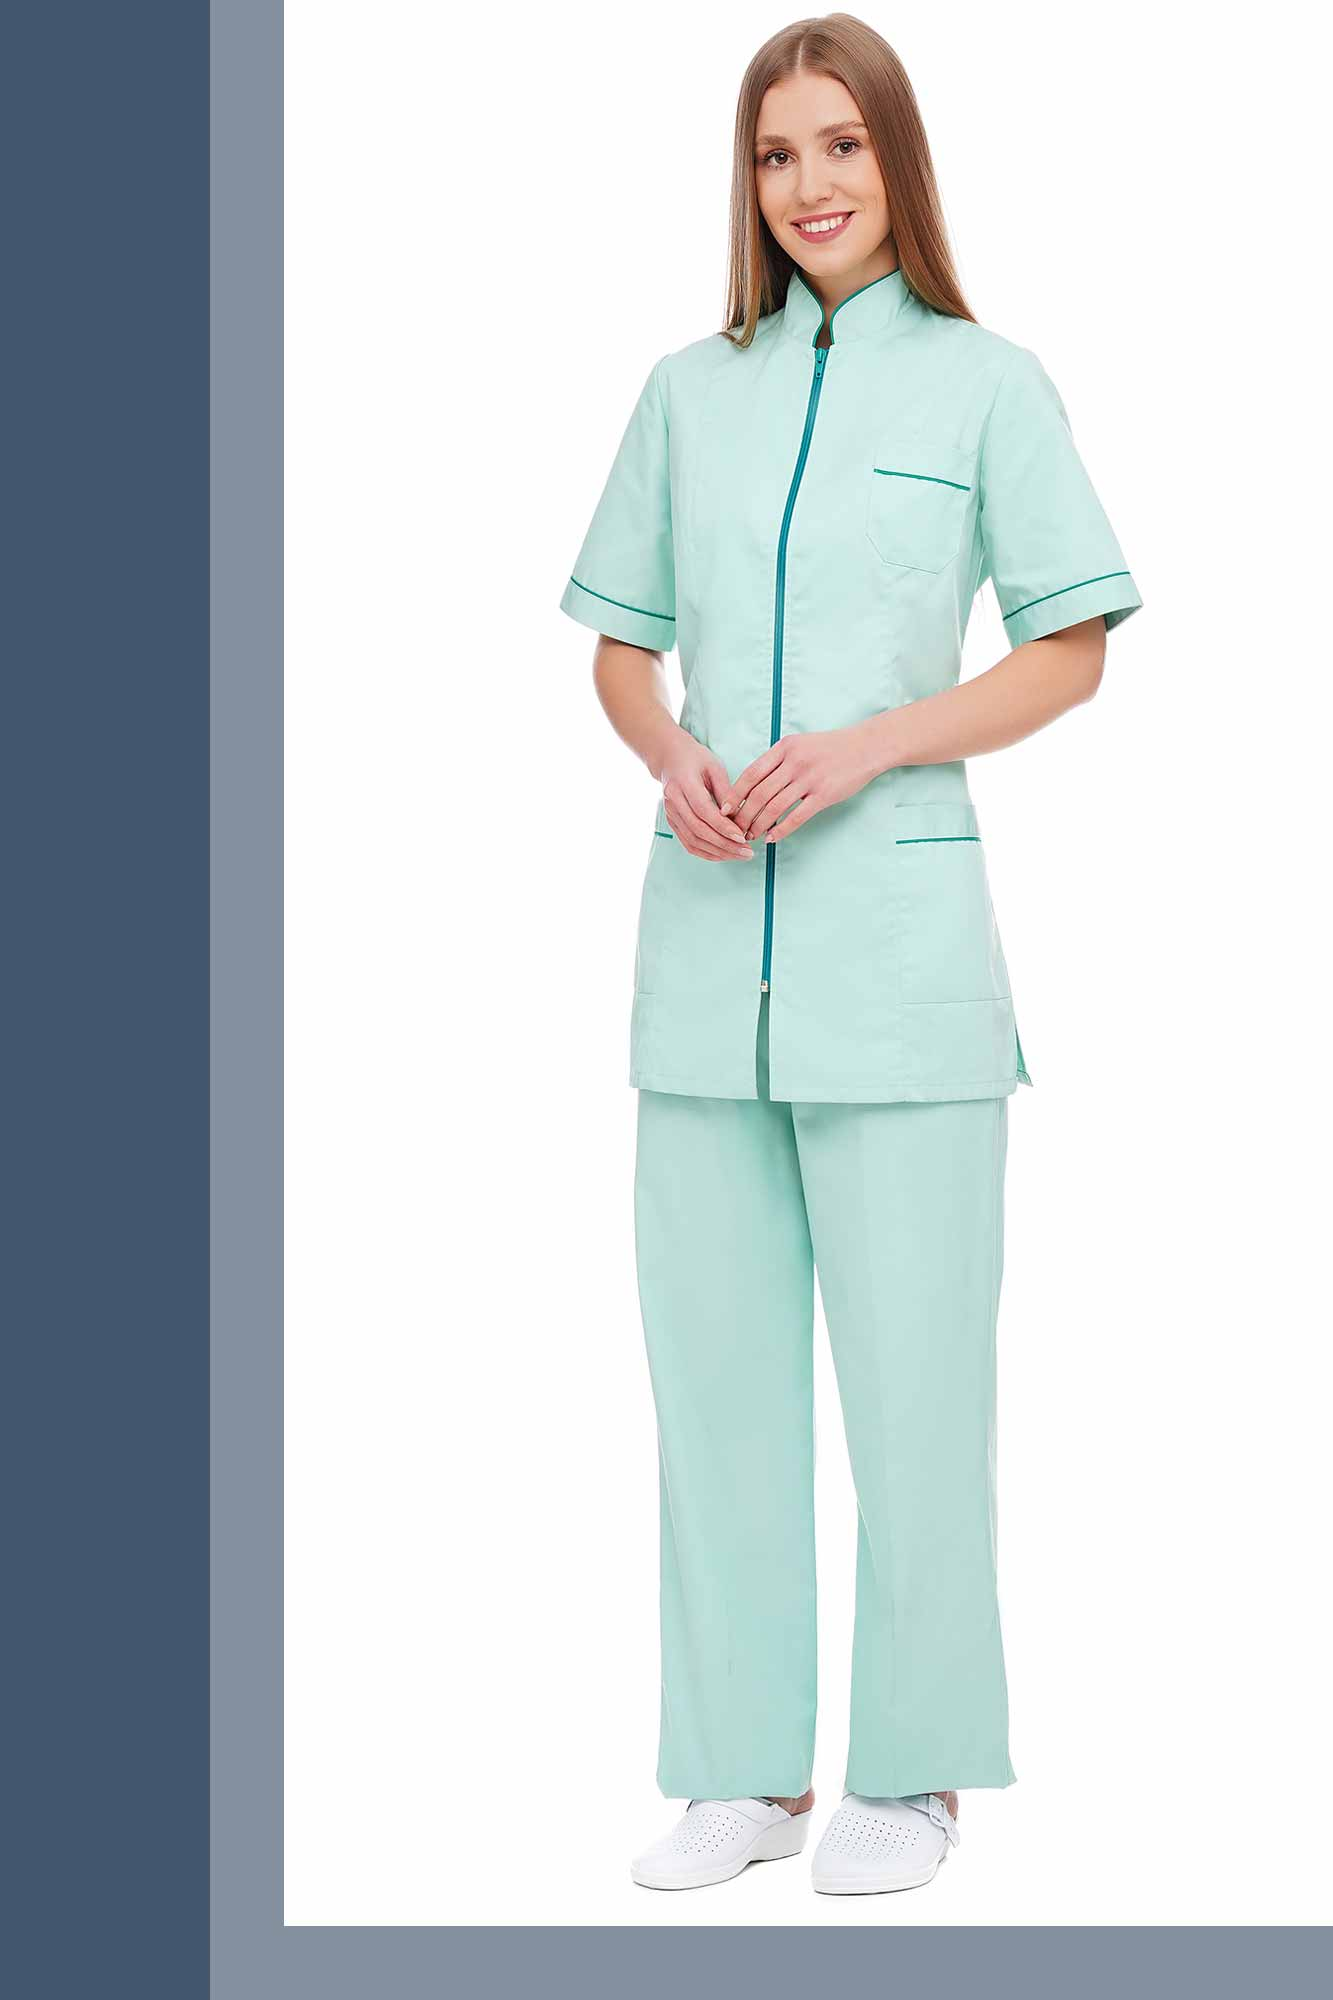 Костюм медичний модельний, модель №04